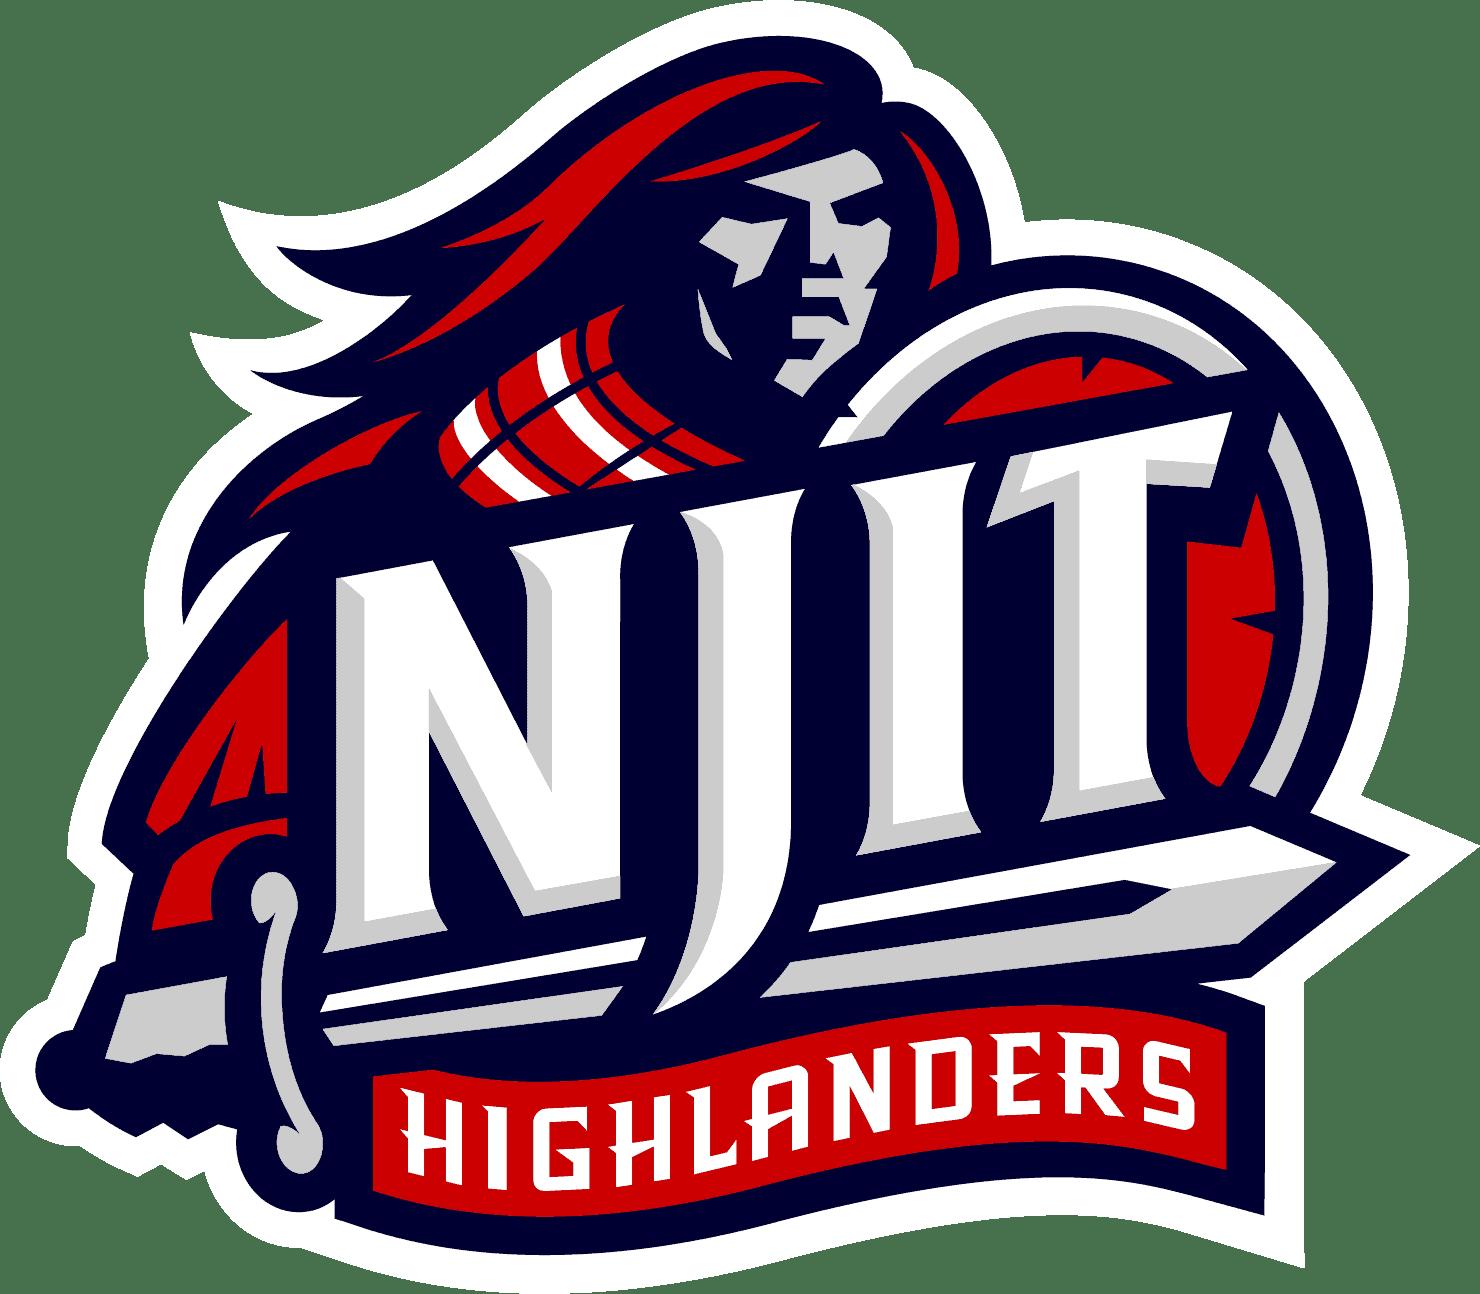 New Jersey Tech Highlanders Logo png